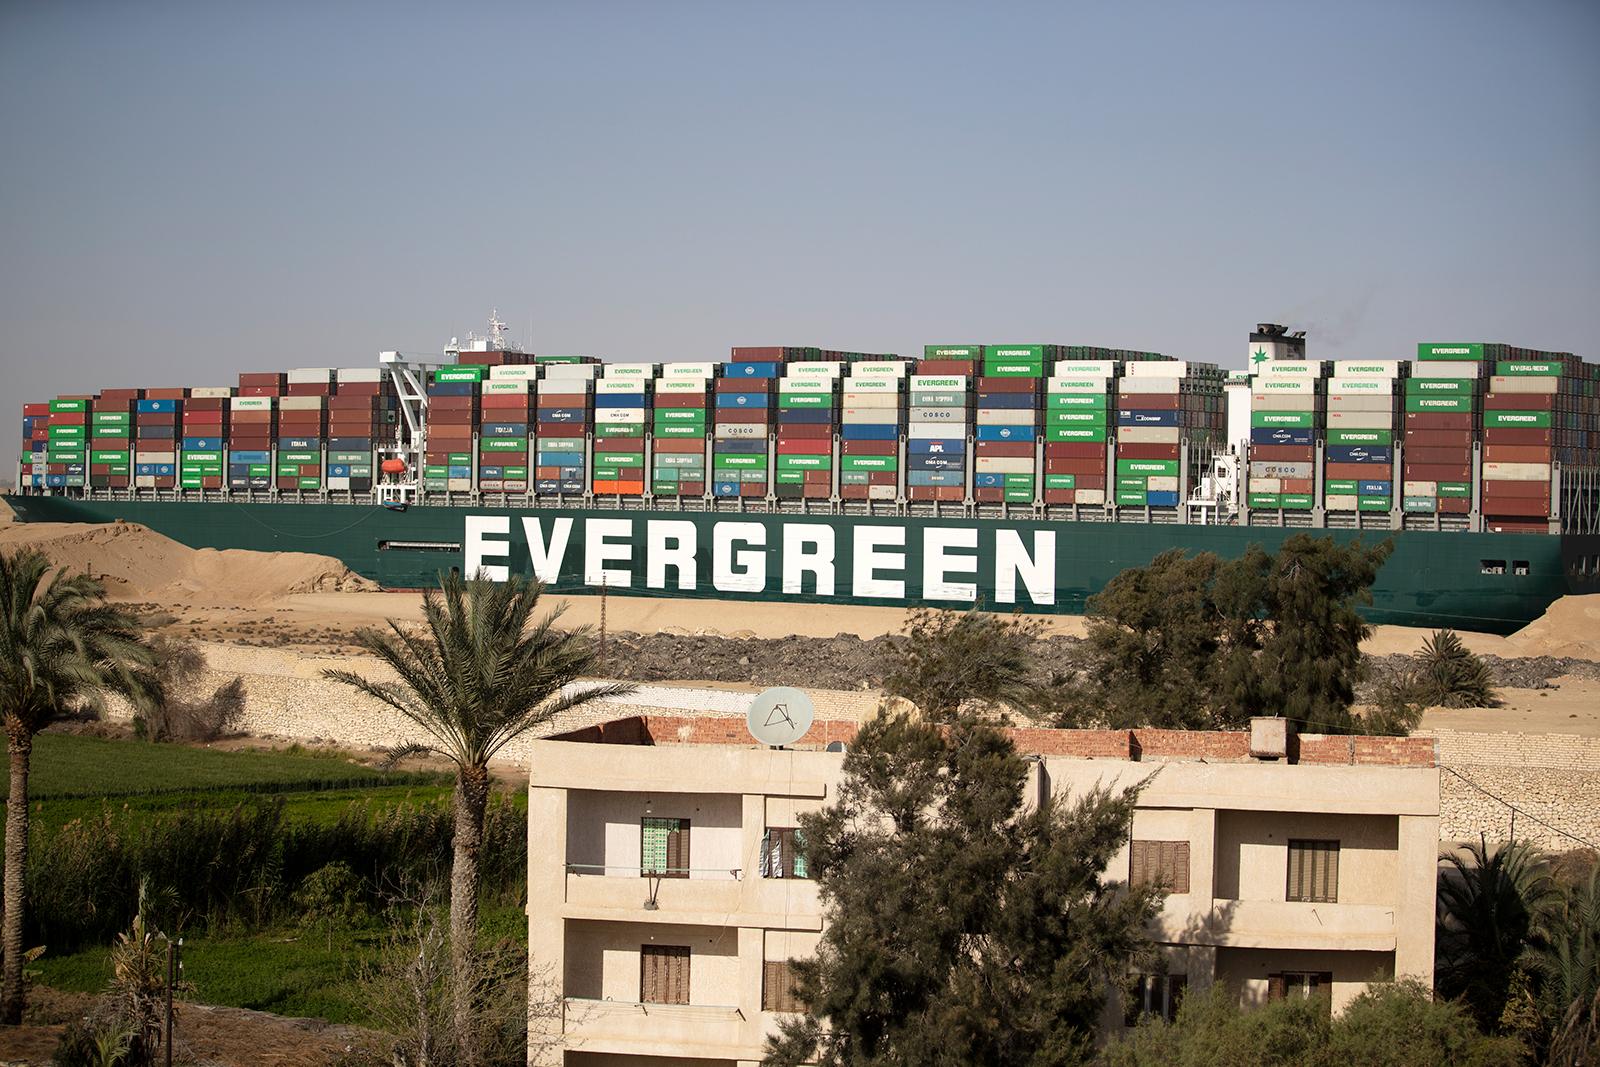 Egypt impounds Ever Given ship over $900 million Suez Canal compensation bill